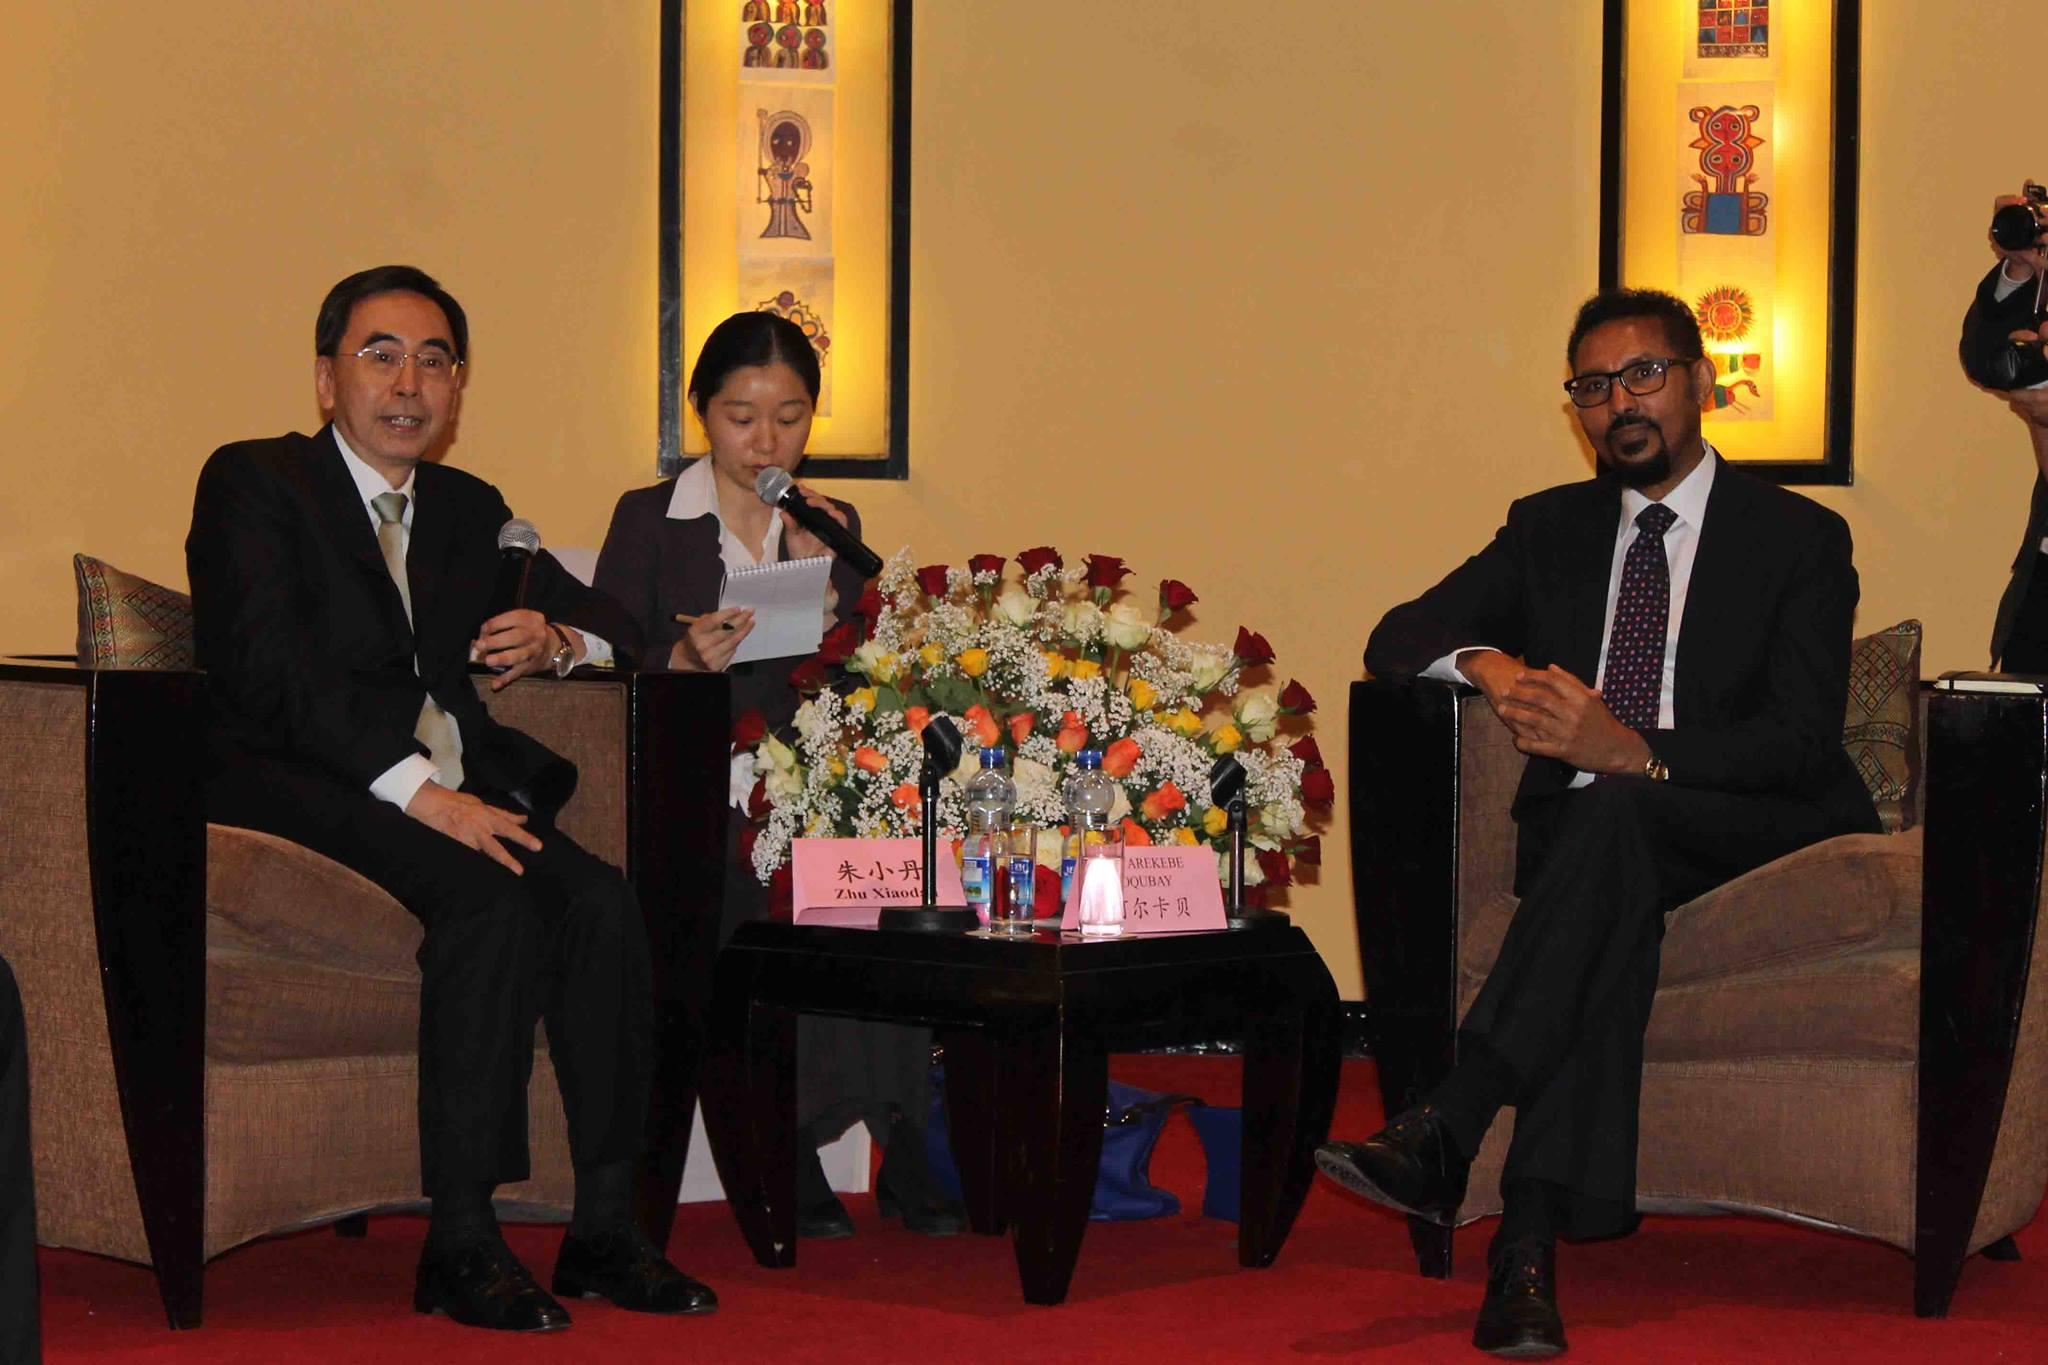 ethiopia china Ethiopia-China Economic and Trade Cooperation Conference